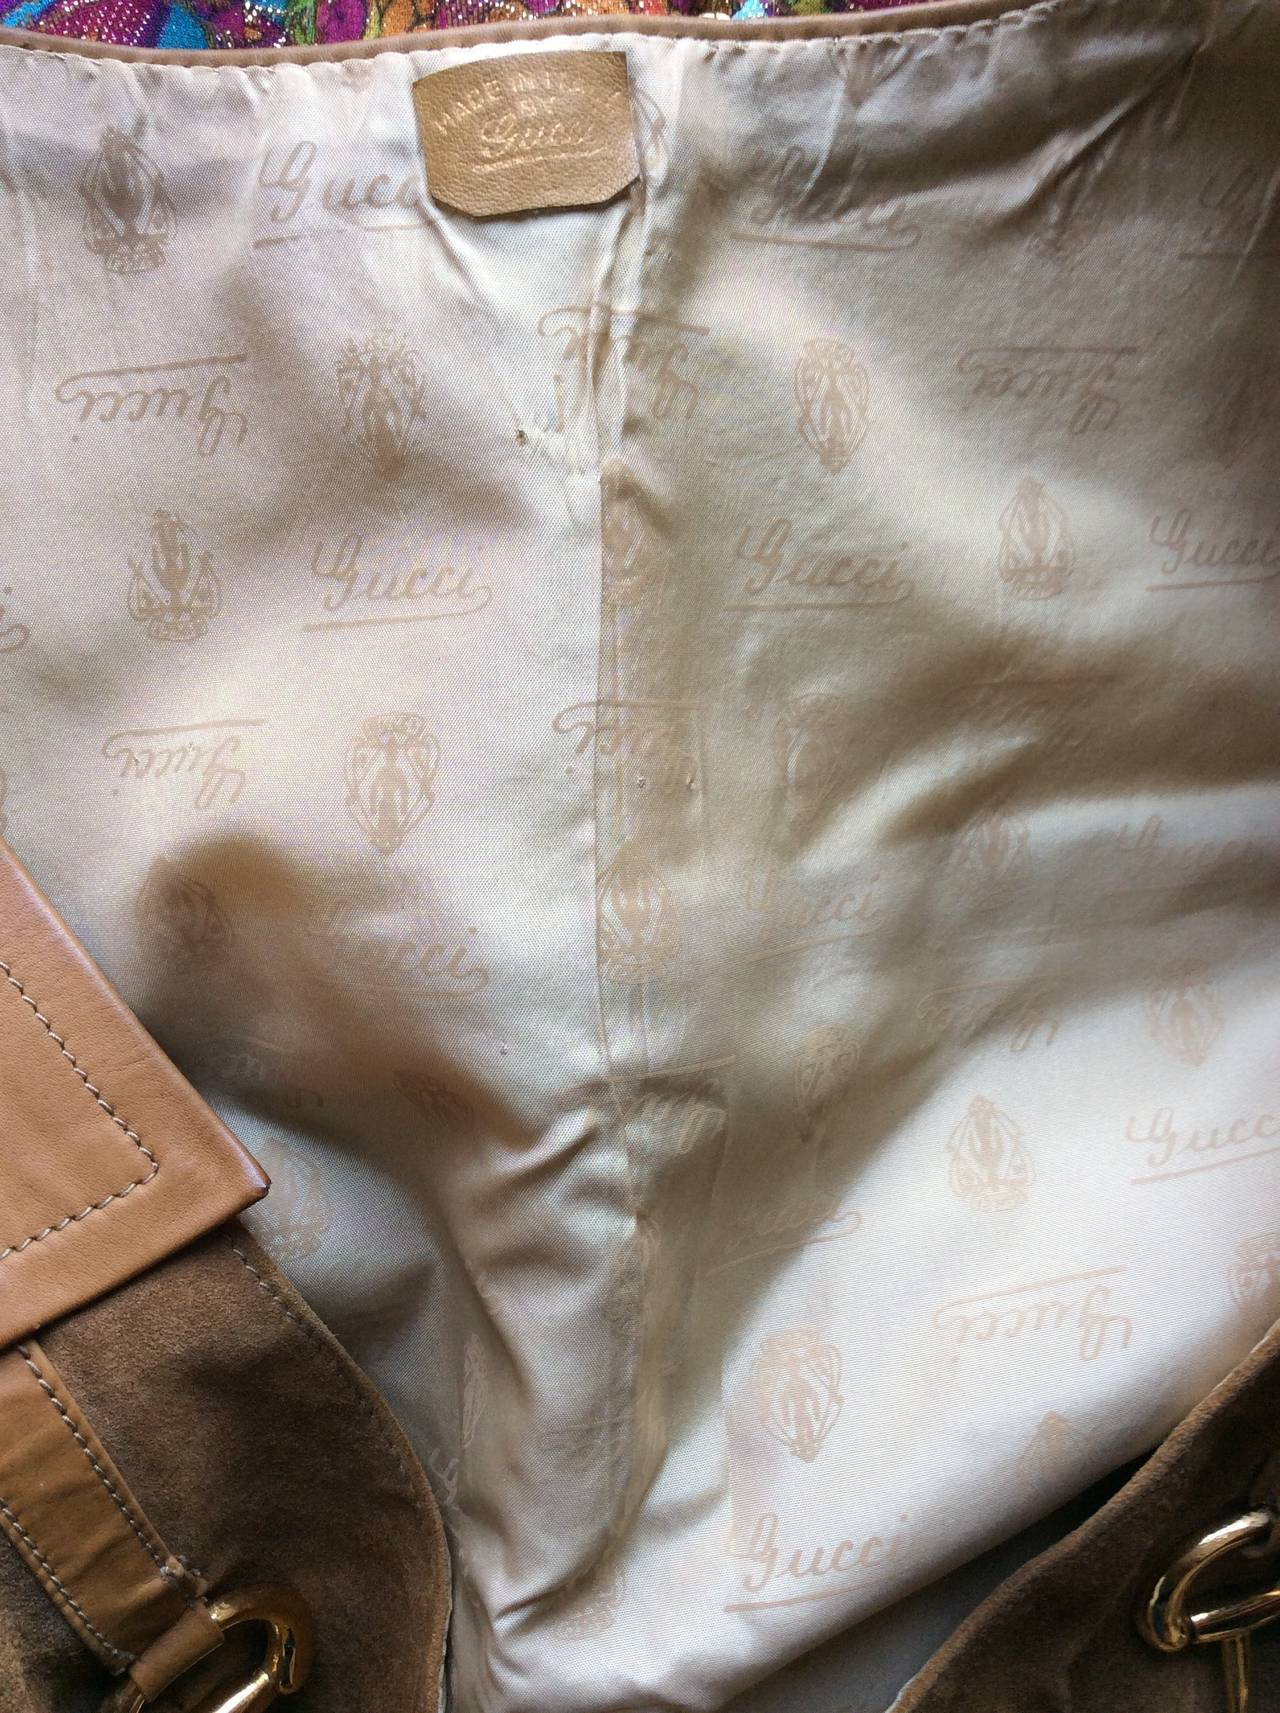 Rare Vintage 1960s Gucci Tan Leather Horsebit A - Line Space Age Dress 7